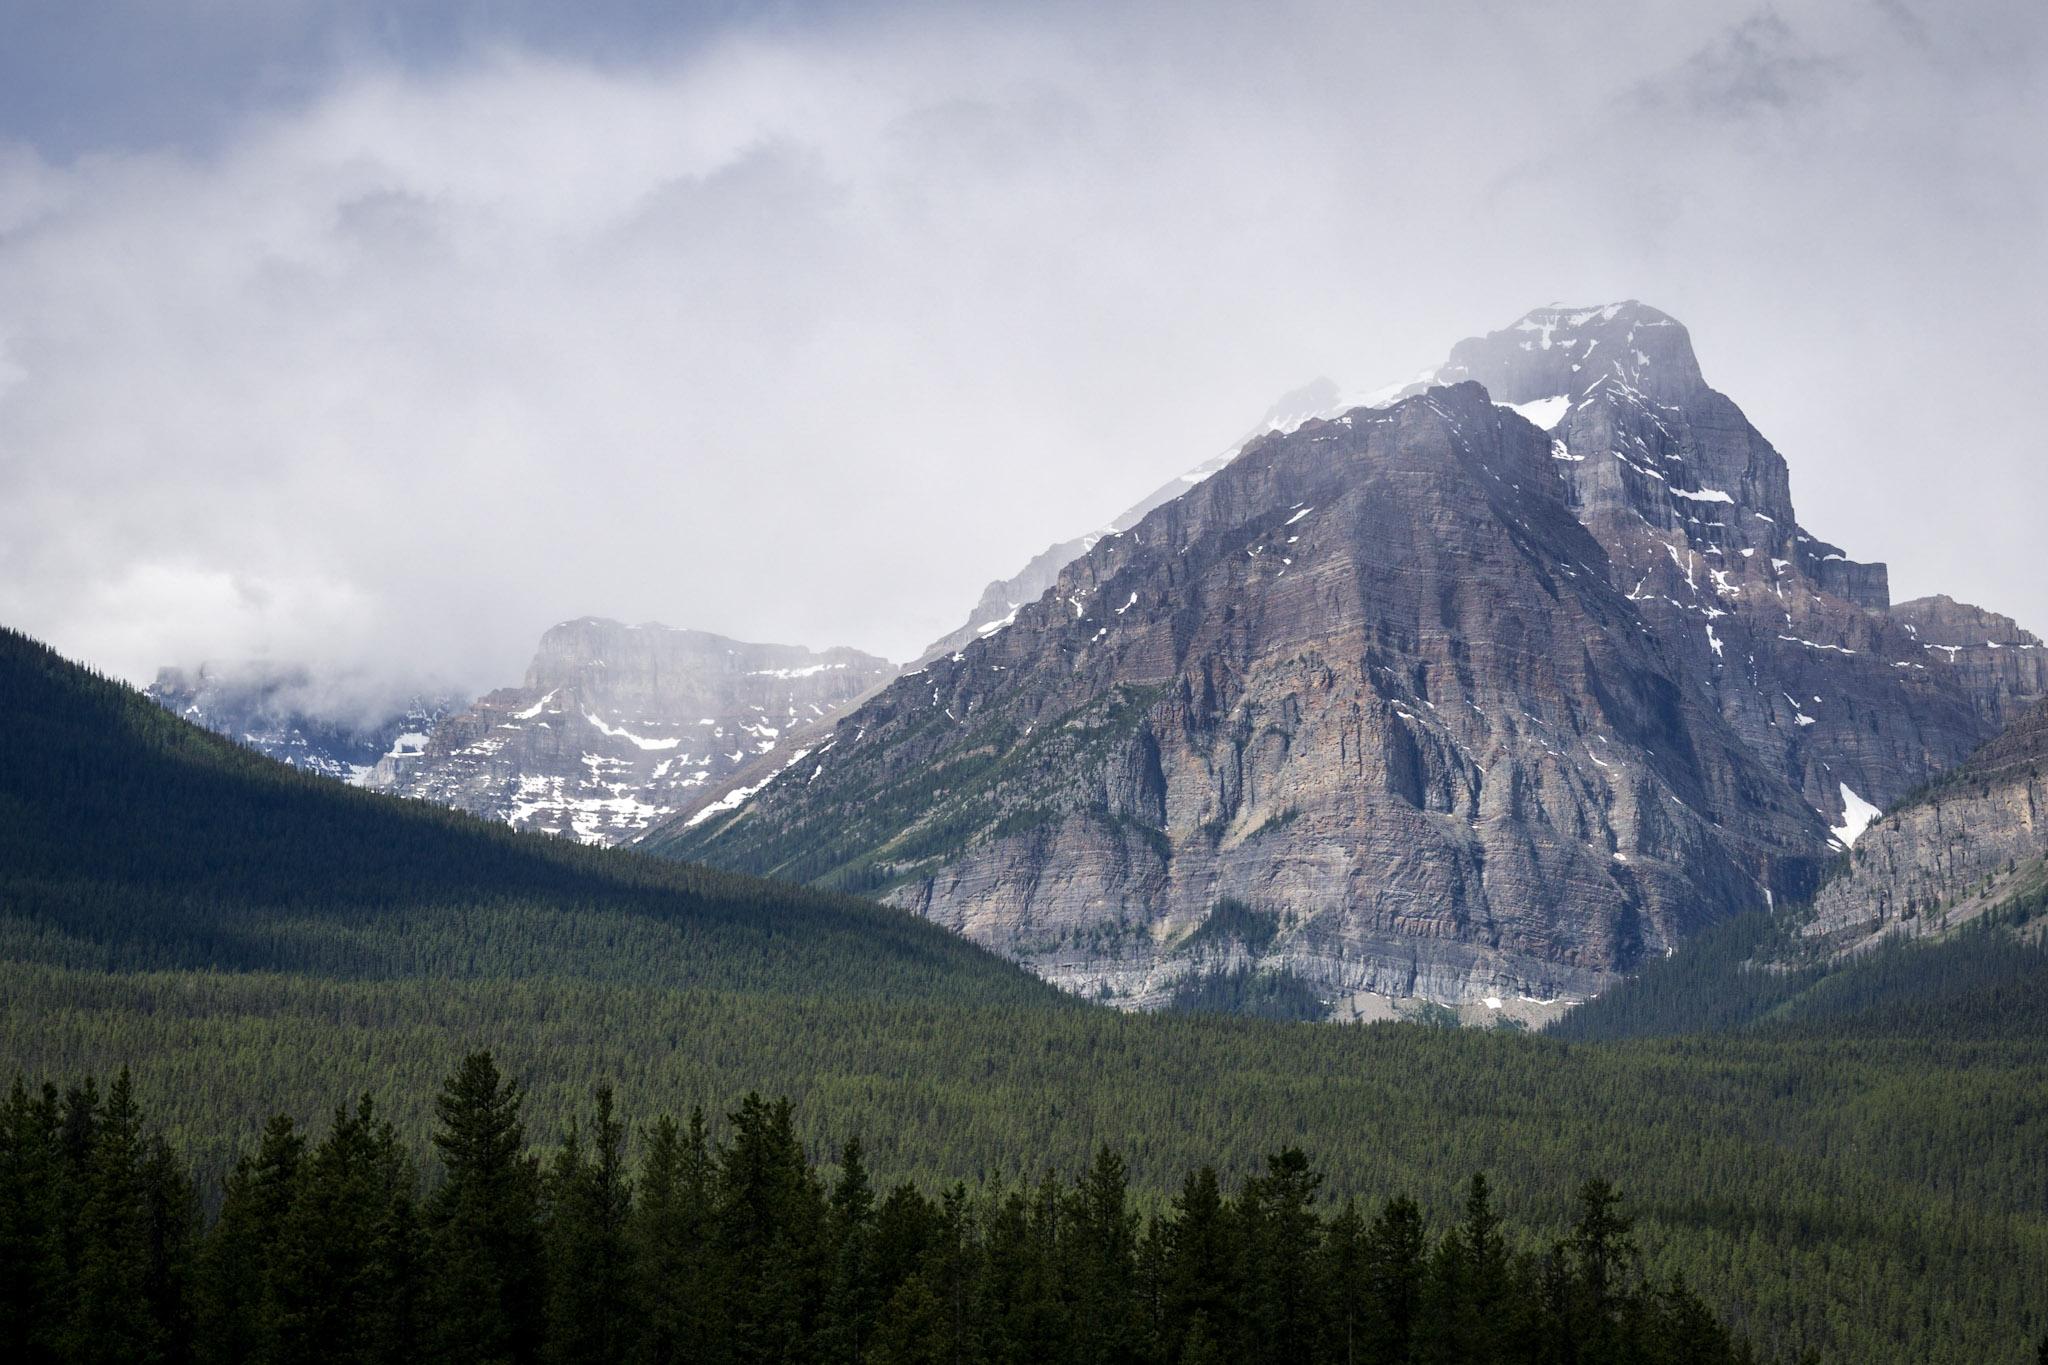 Passing Storm, Banff National Park, Alberta, Canada